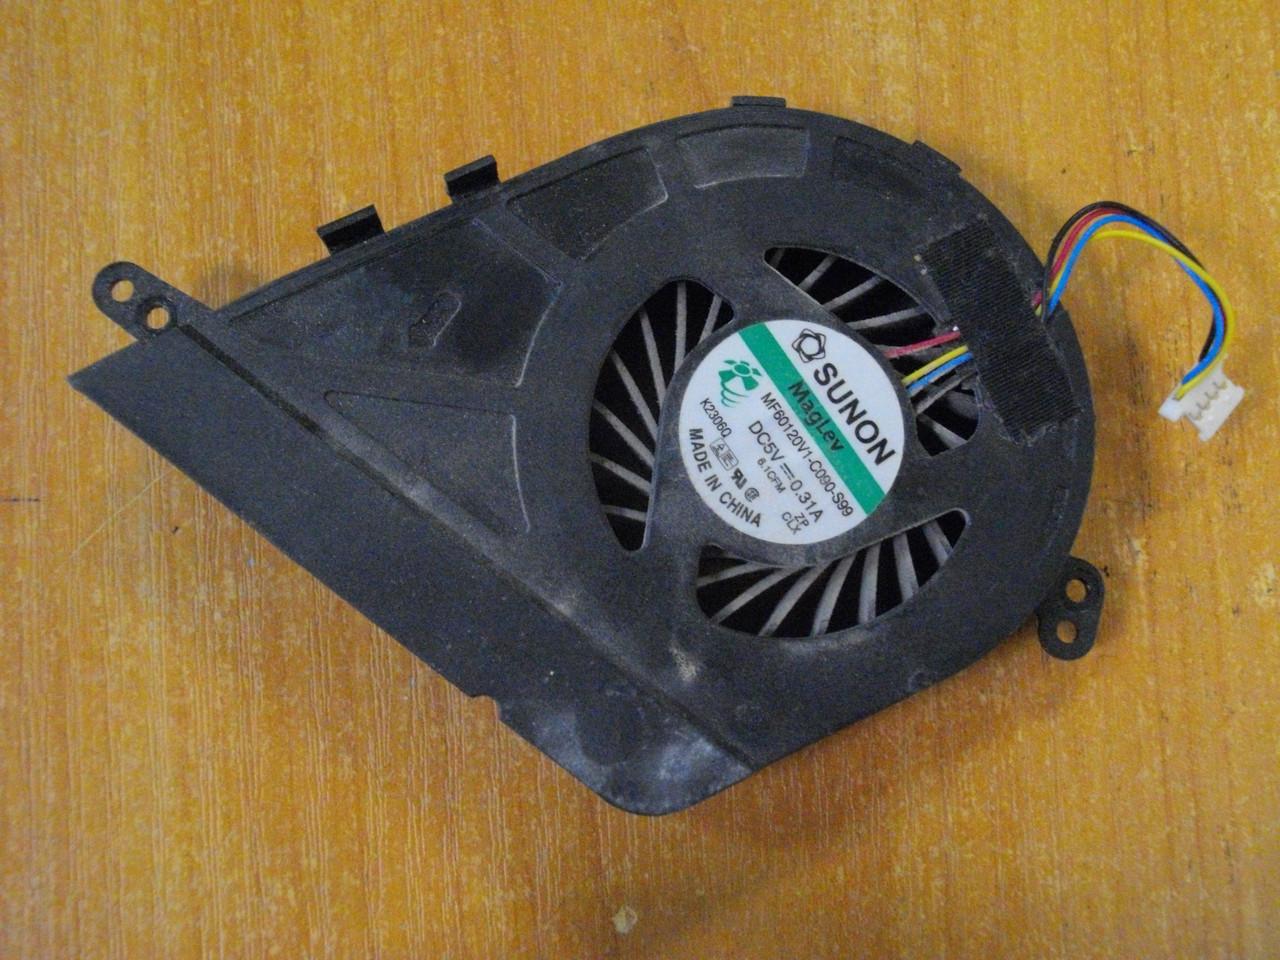 Вентилятор оригинальный DELL Latitude E5420 БУ